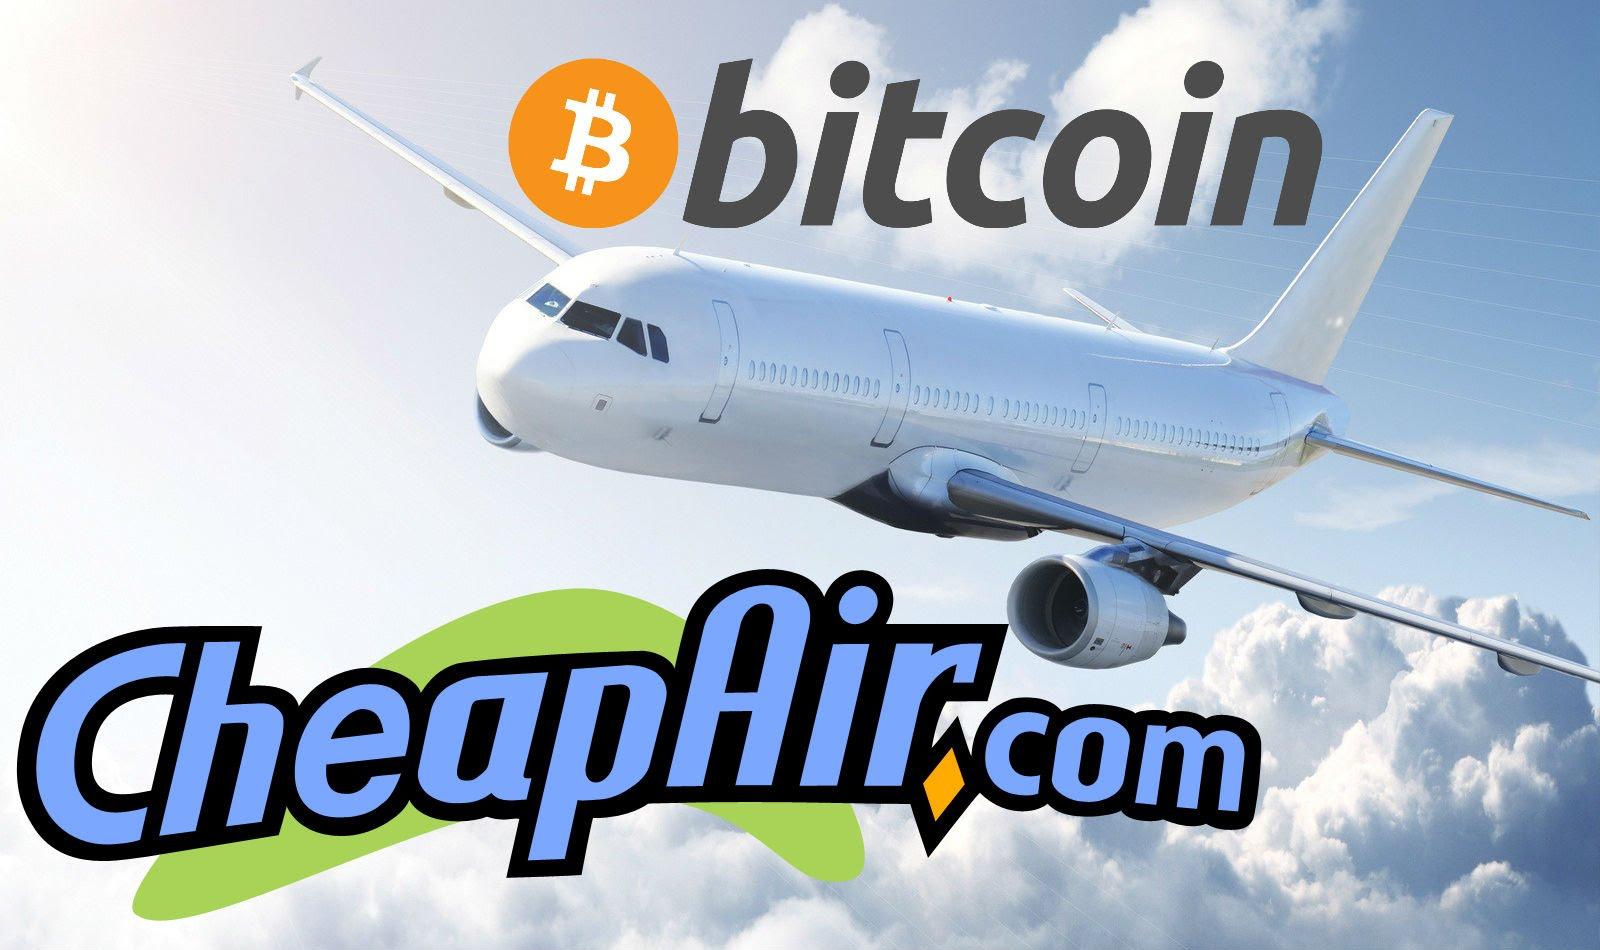 Coinbase прекращает обслуживание CheapAir